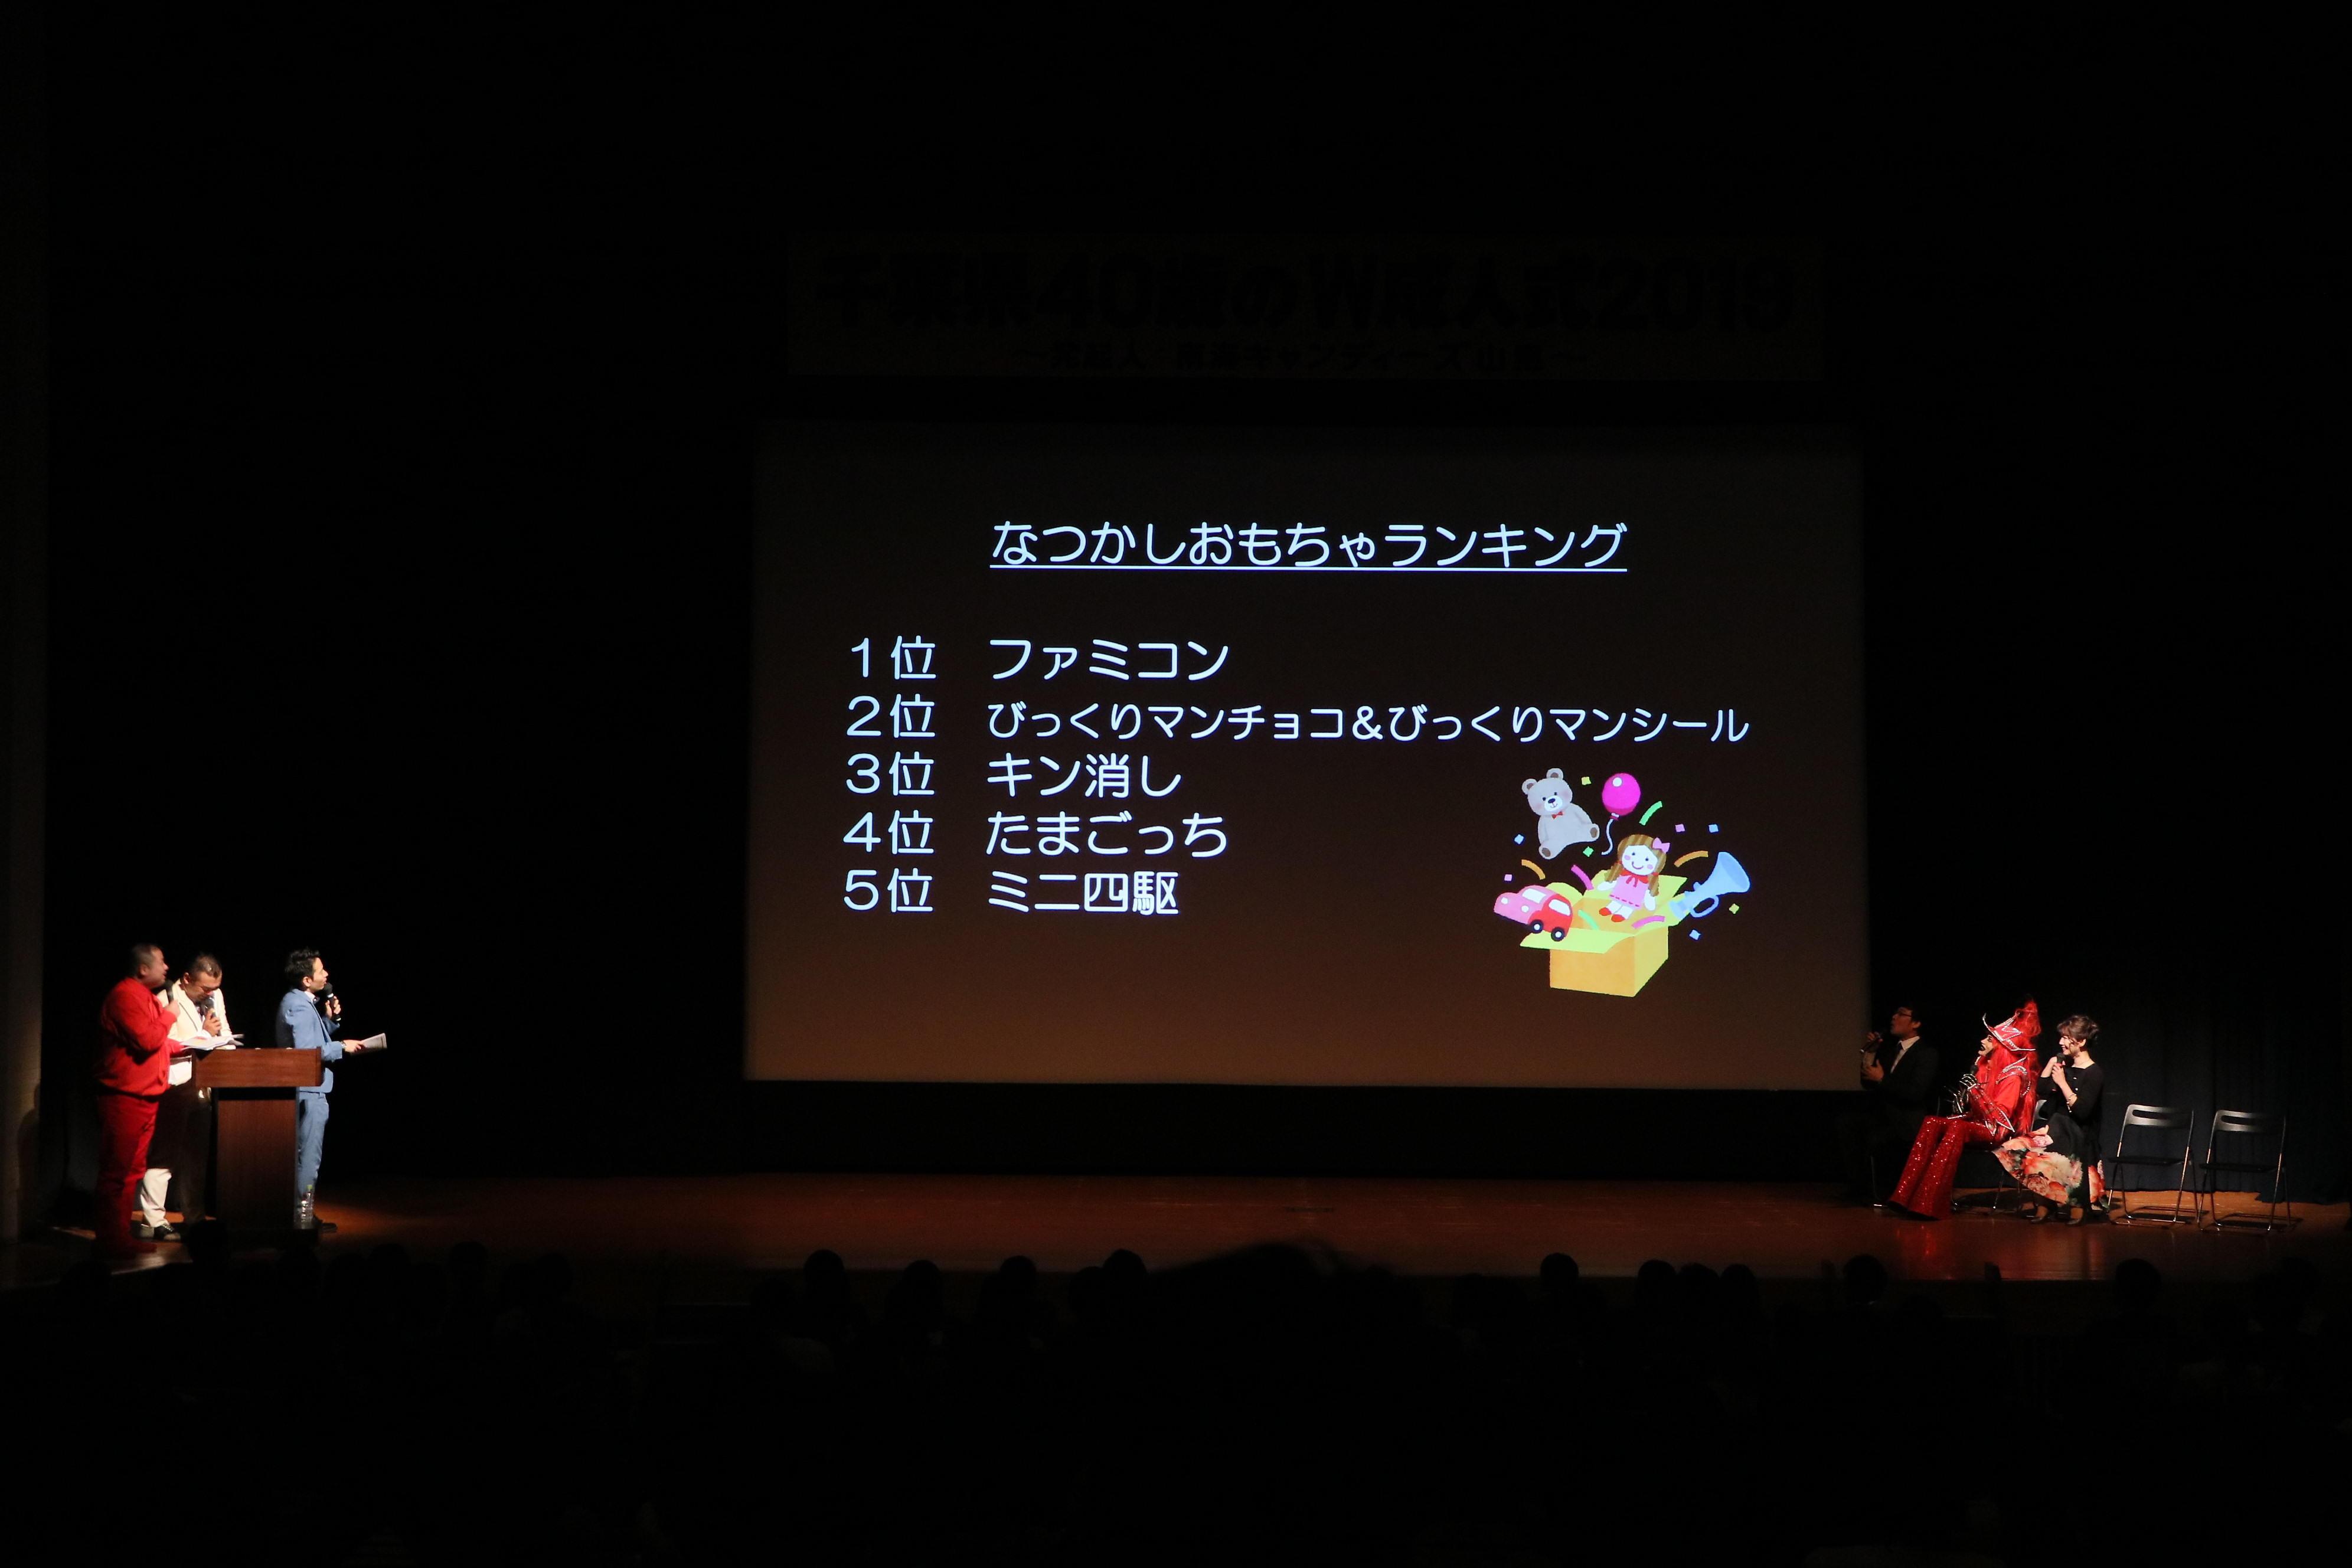 http://news.yoshimoto.co.jp/20190106222303-9b2ab05d59ab04f5edb355b51cb565a6396ed019.jpg